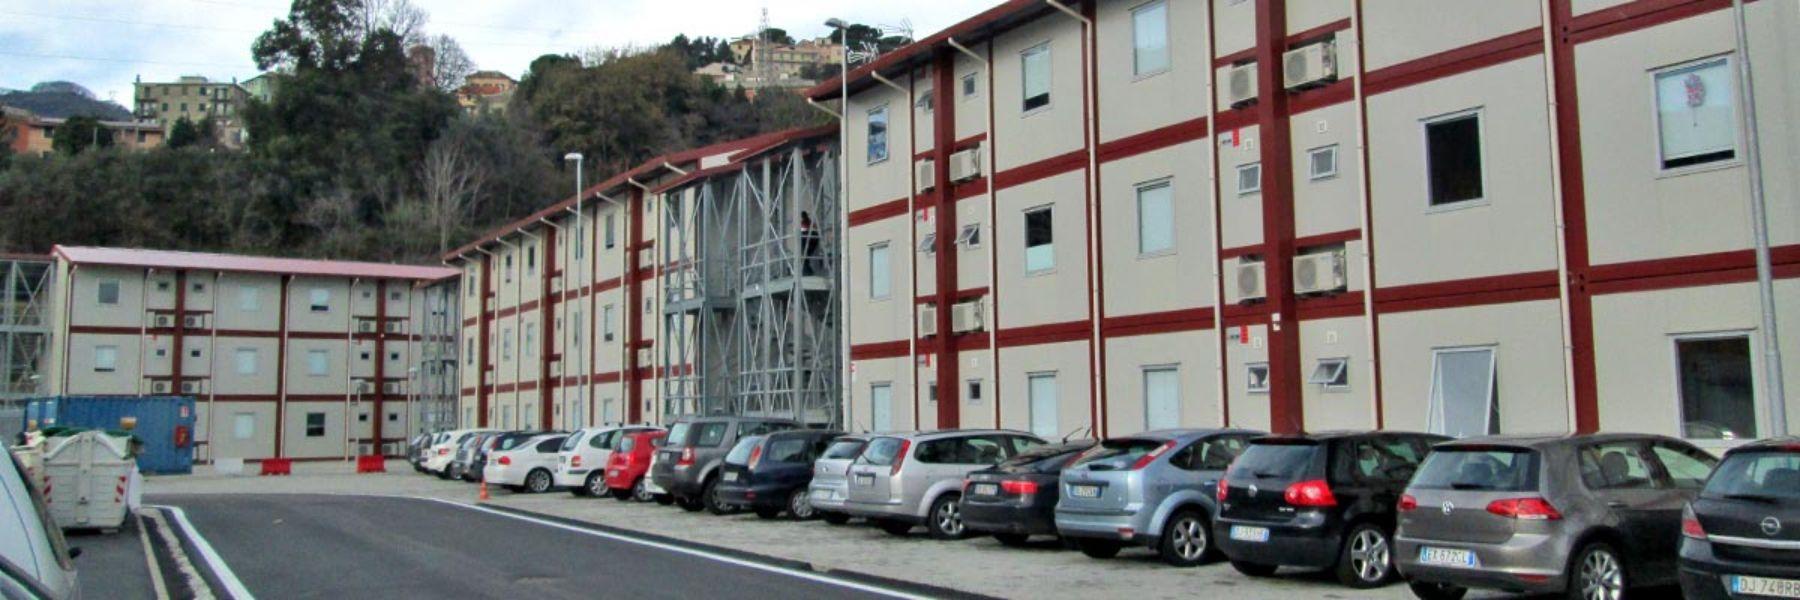 """Alta Velocità Milano-Genova (COCIV)"" | MI GE slide 05"